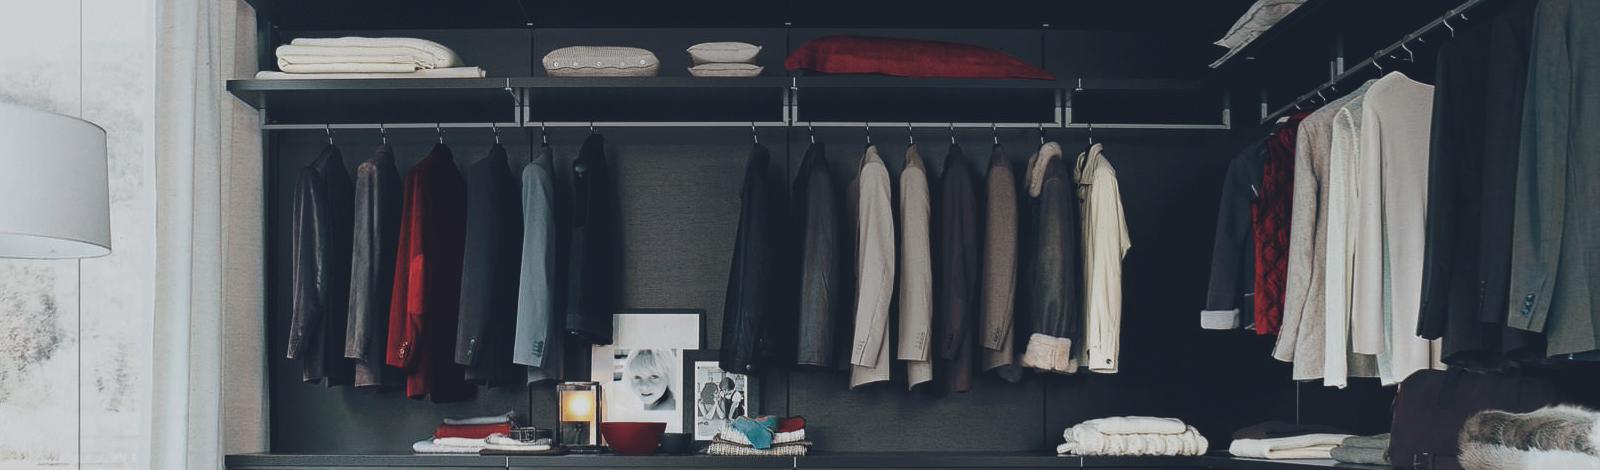 walk in et garde robes sur mesure fabrique plus. Black Bedroom Furniture Sets. Home Design Ideas